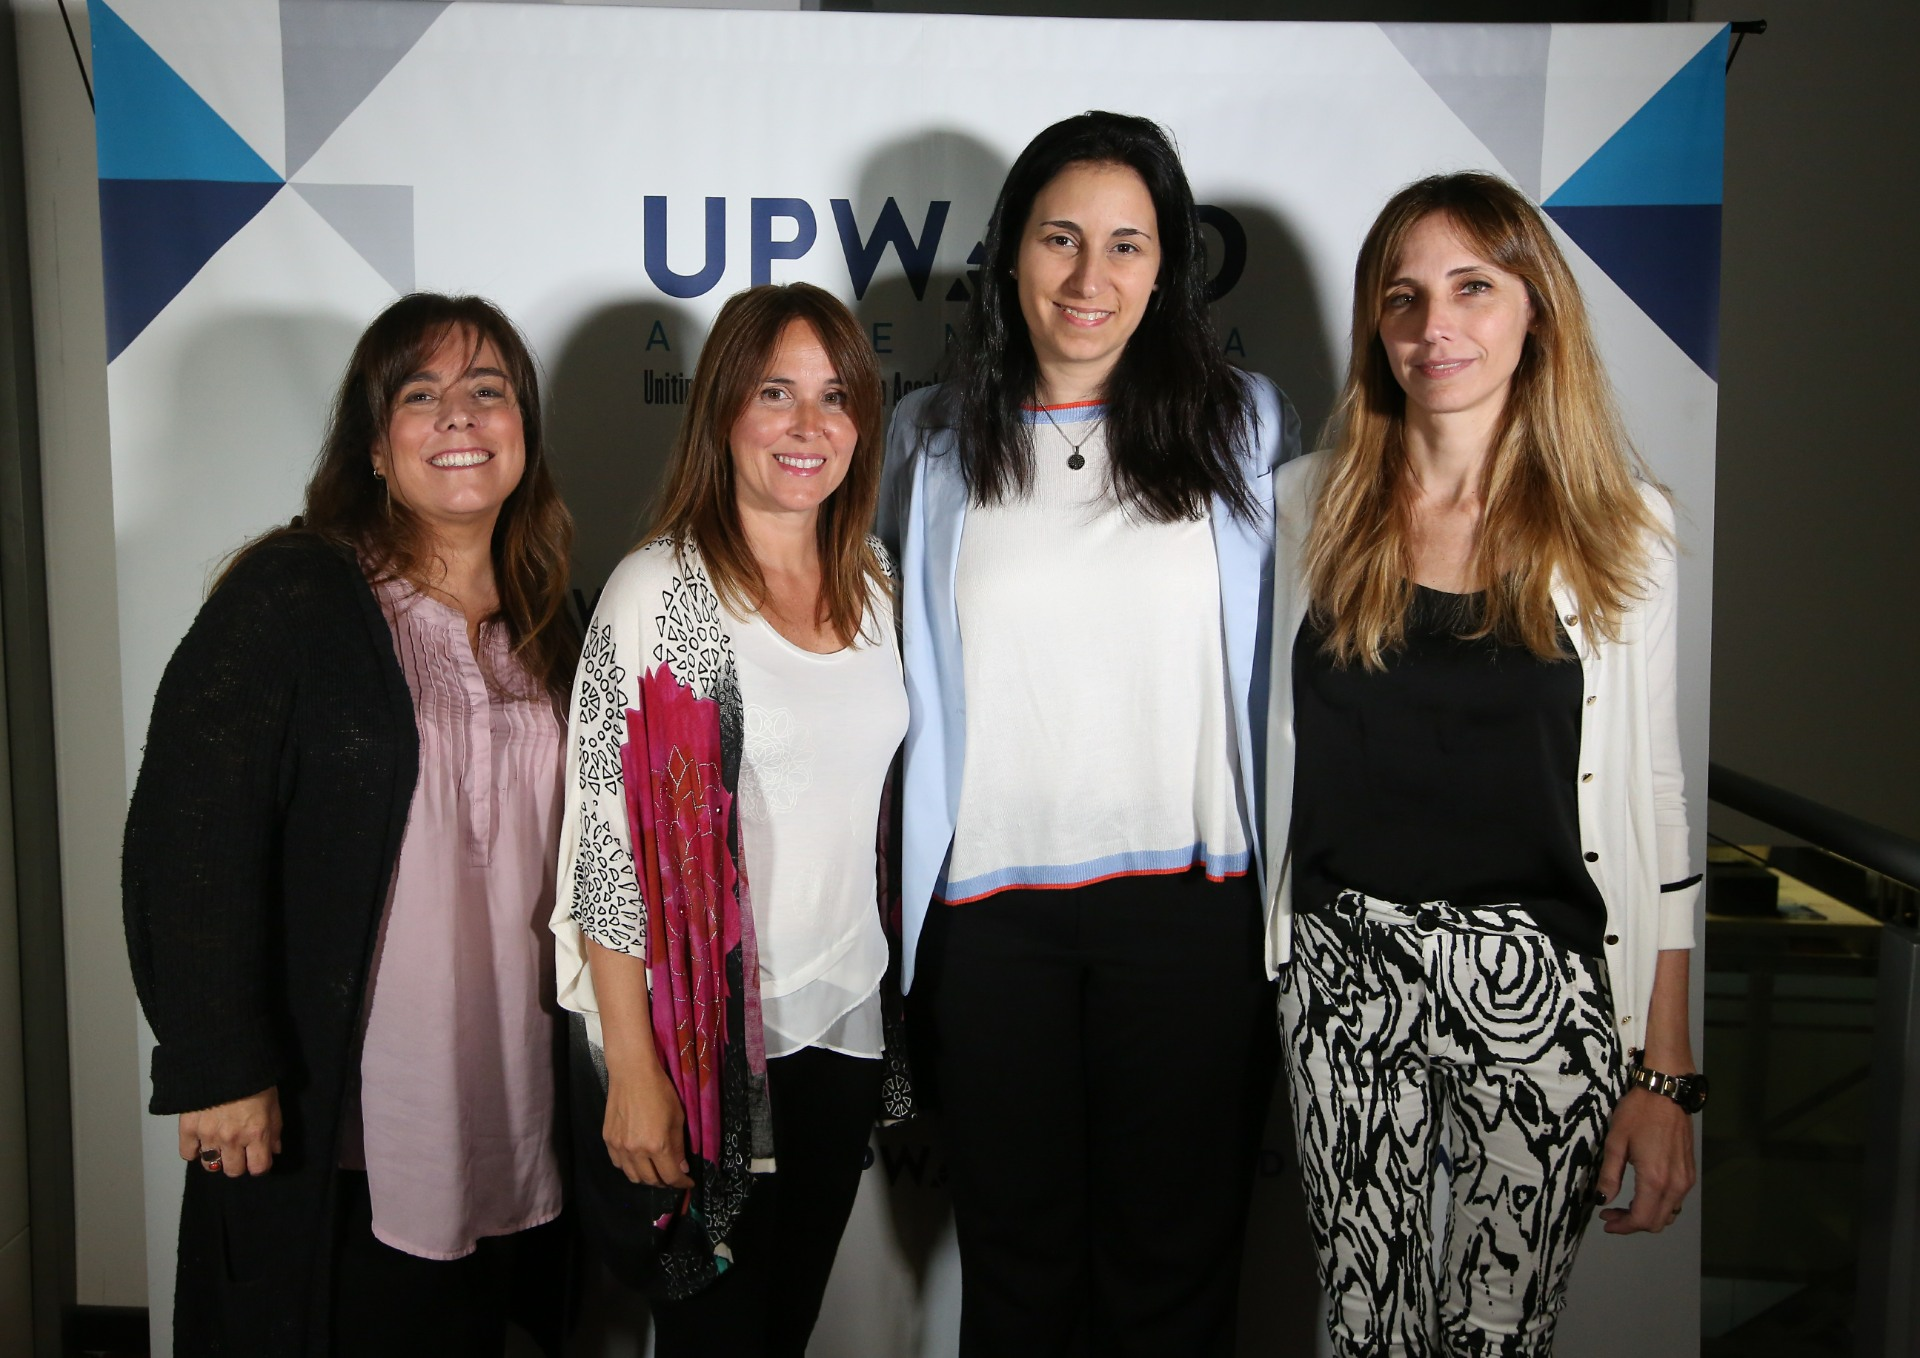 Solange Curutchet (YuMe Argentina), Verónica Vázquez (directora comercial de Walmart), Carolina Capitelli (Gerente de Operaciones de Nielsen) y Cecilia Frka (Gerente de Comunicaciones de Nielsen)